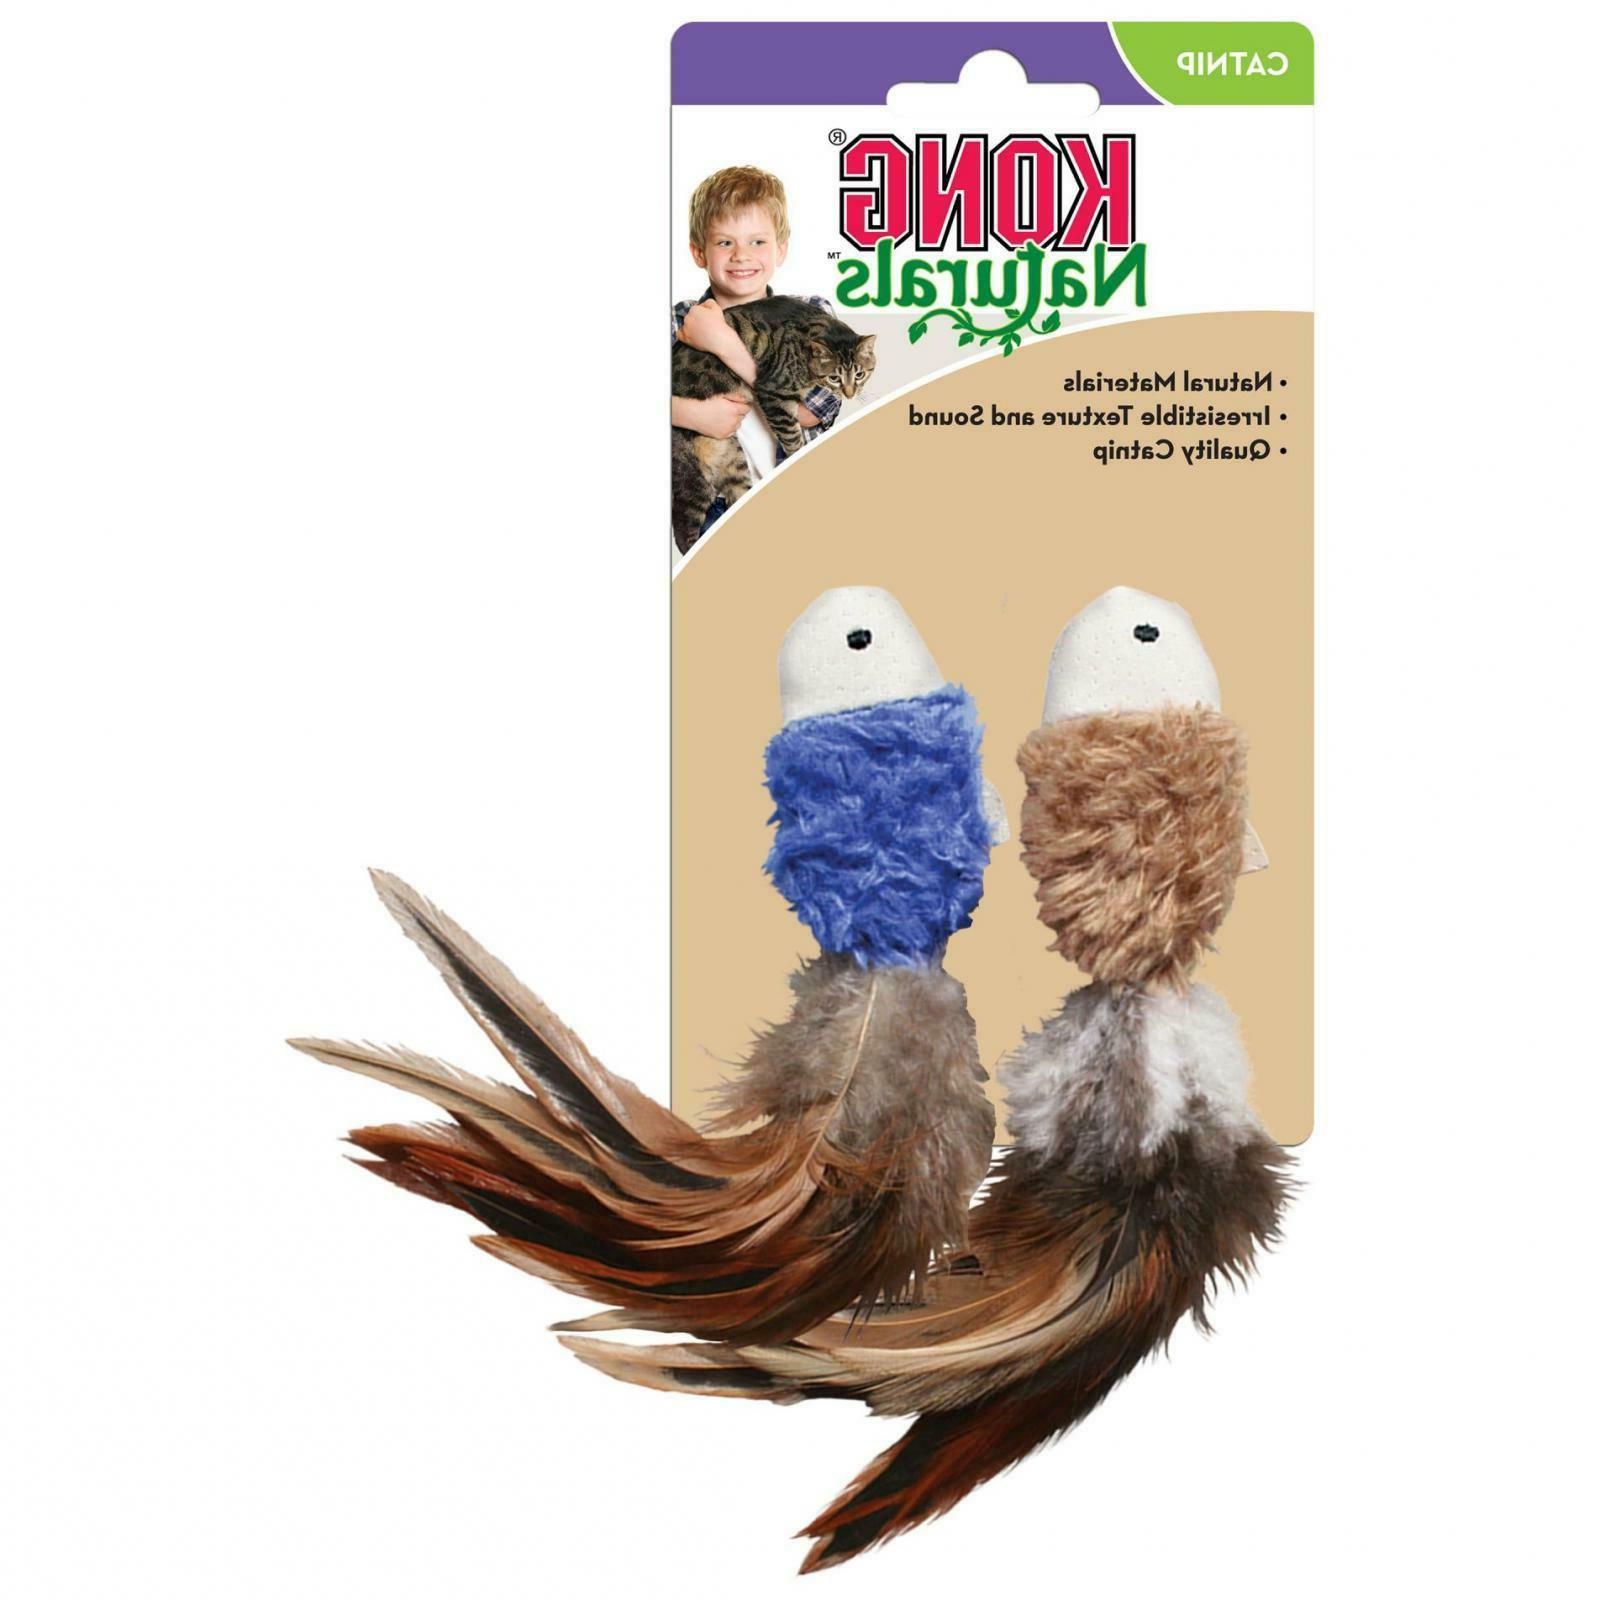 KONG Catnip Toy, 2-Pack